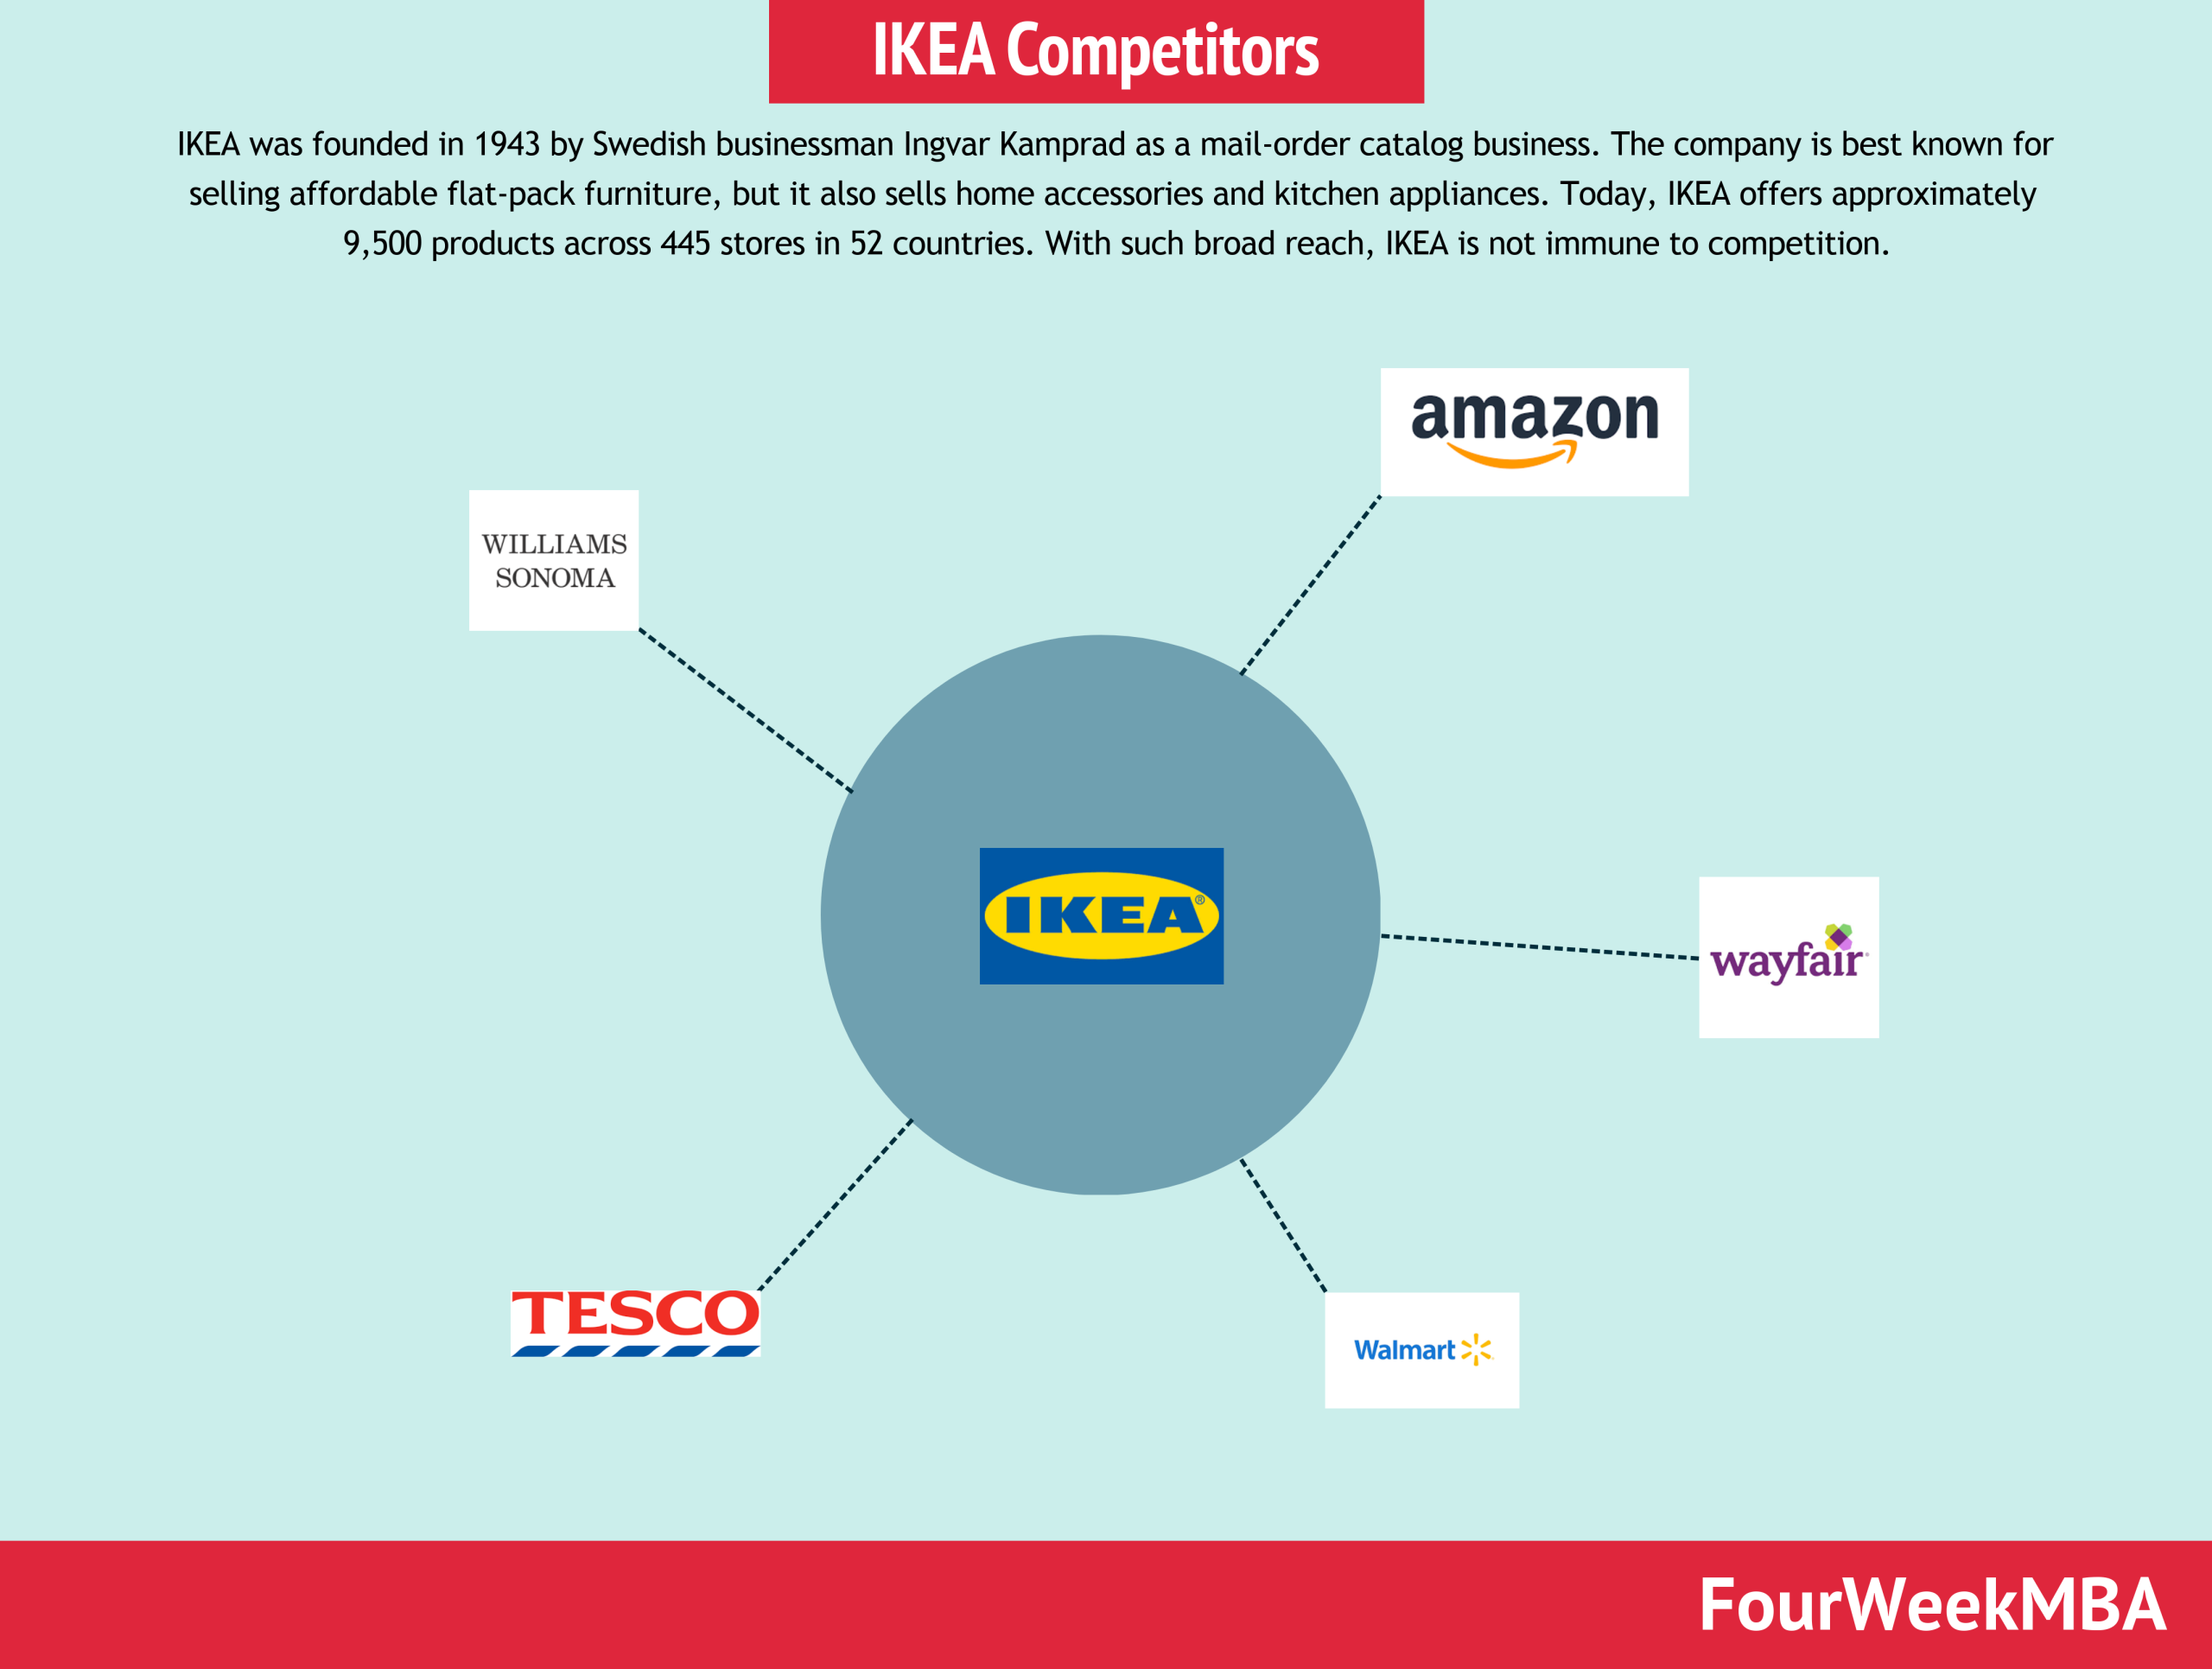 ikea-competitors